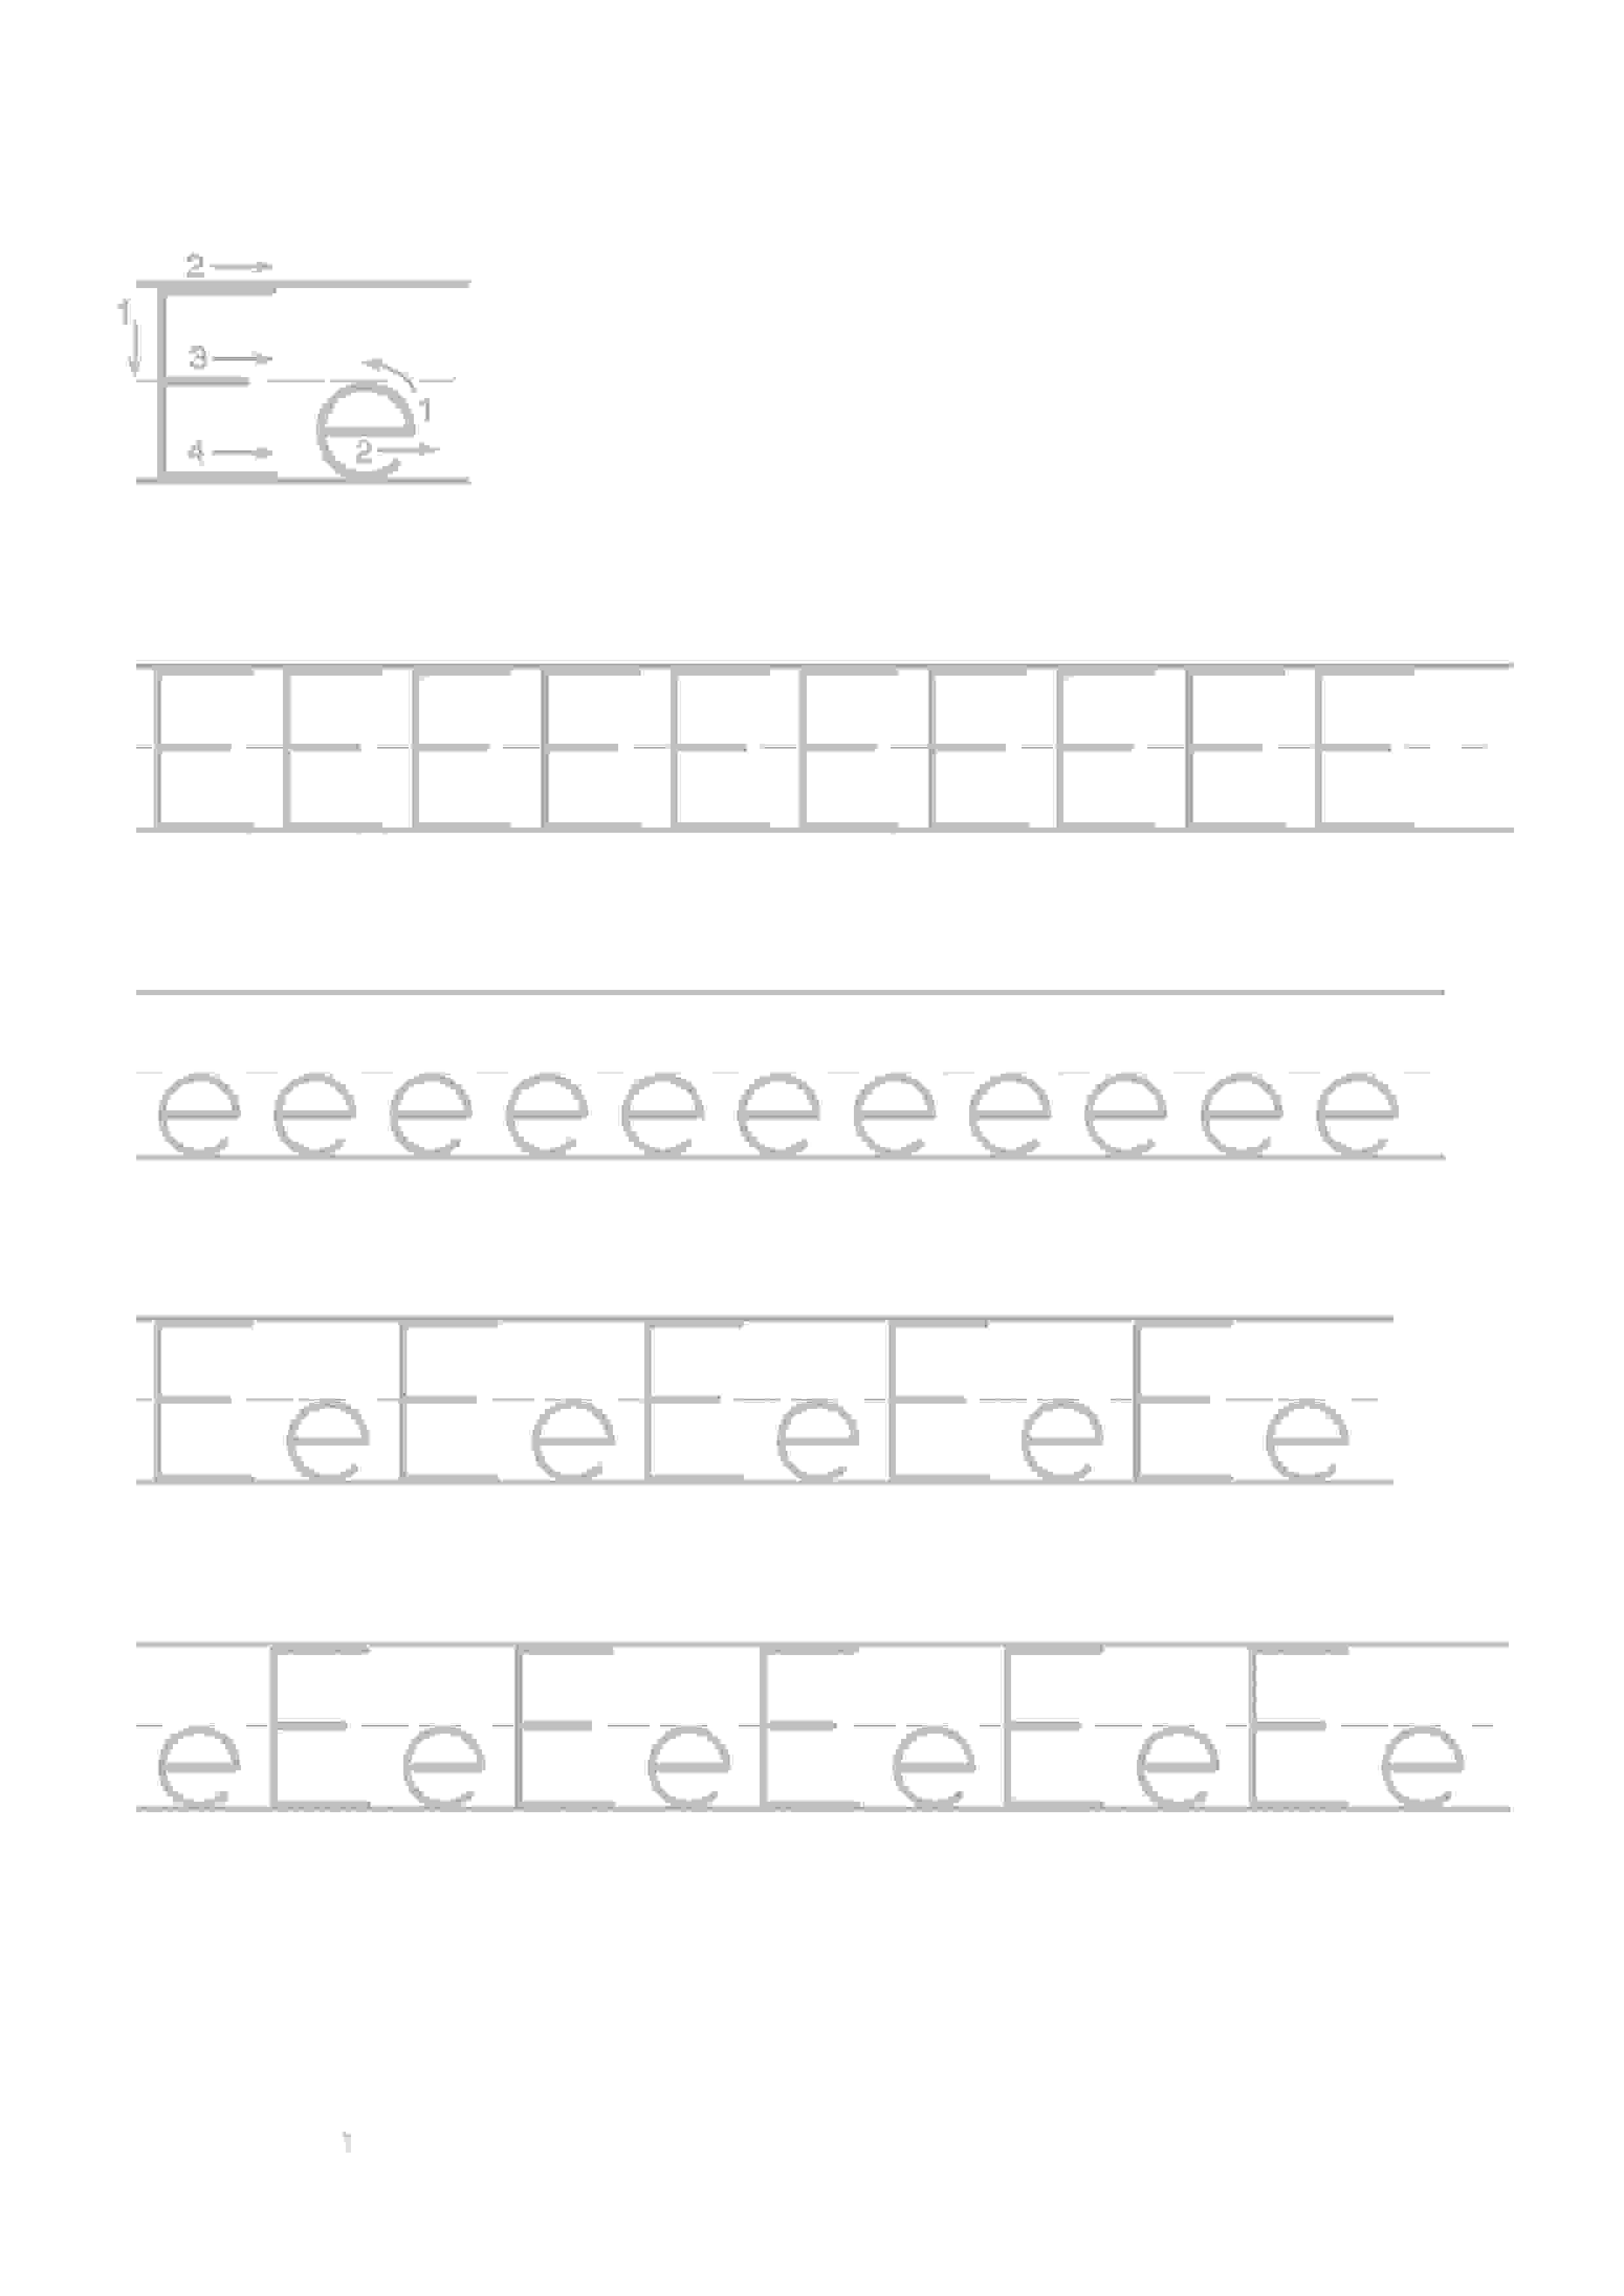 Printable Worksheets For Kids Alphabet Handwriting 5